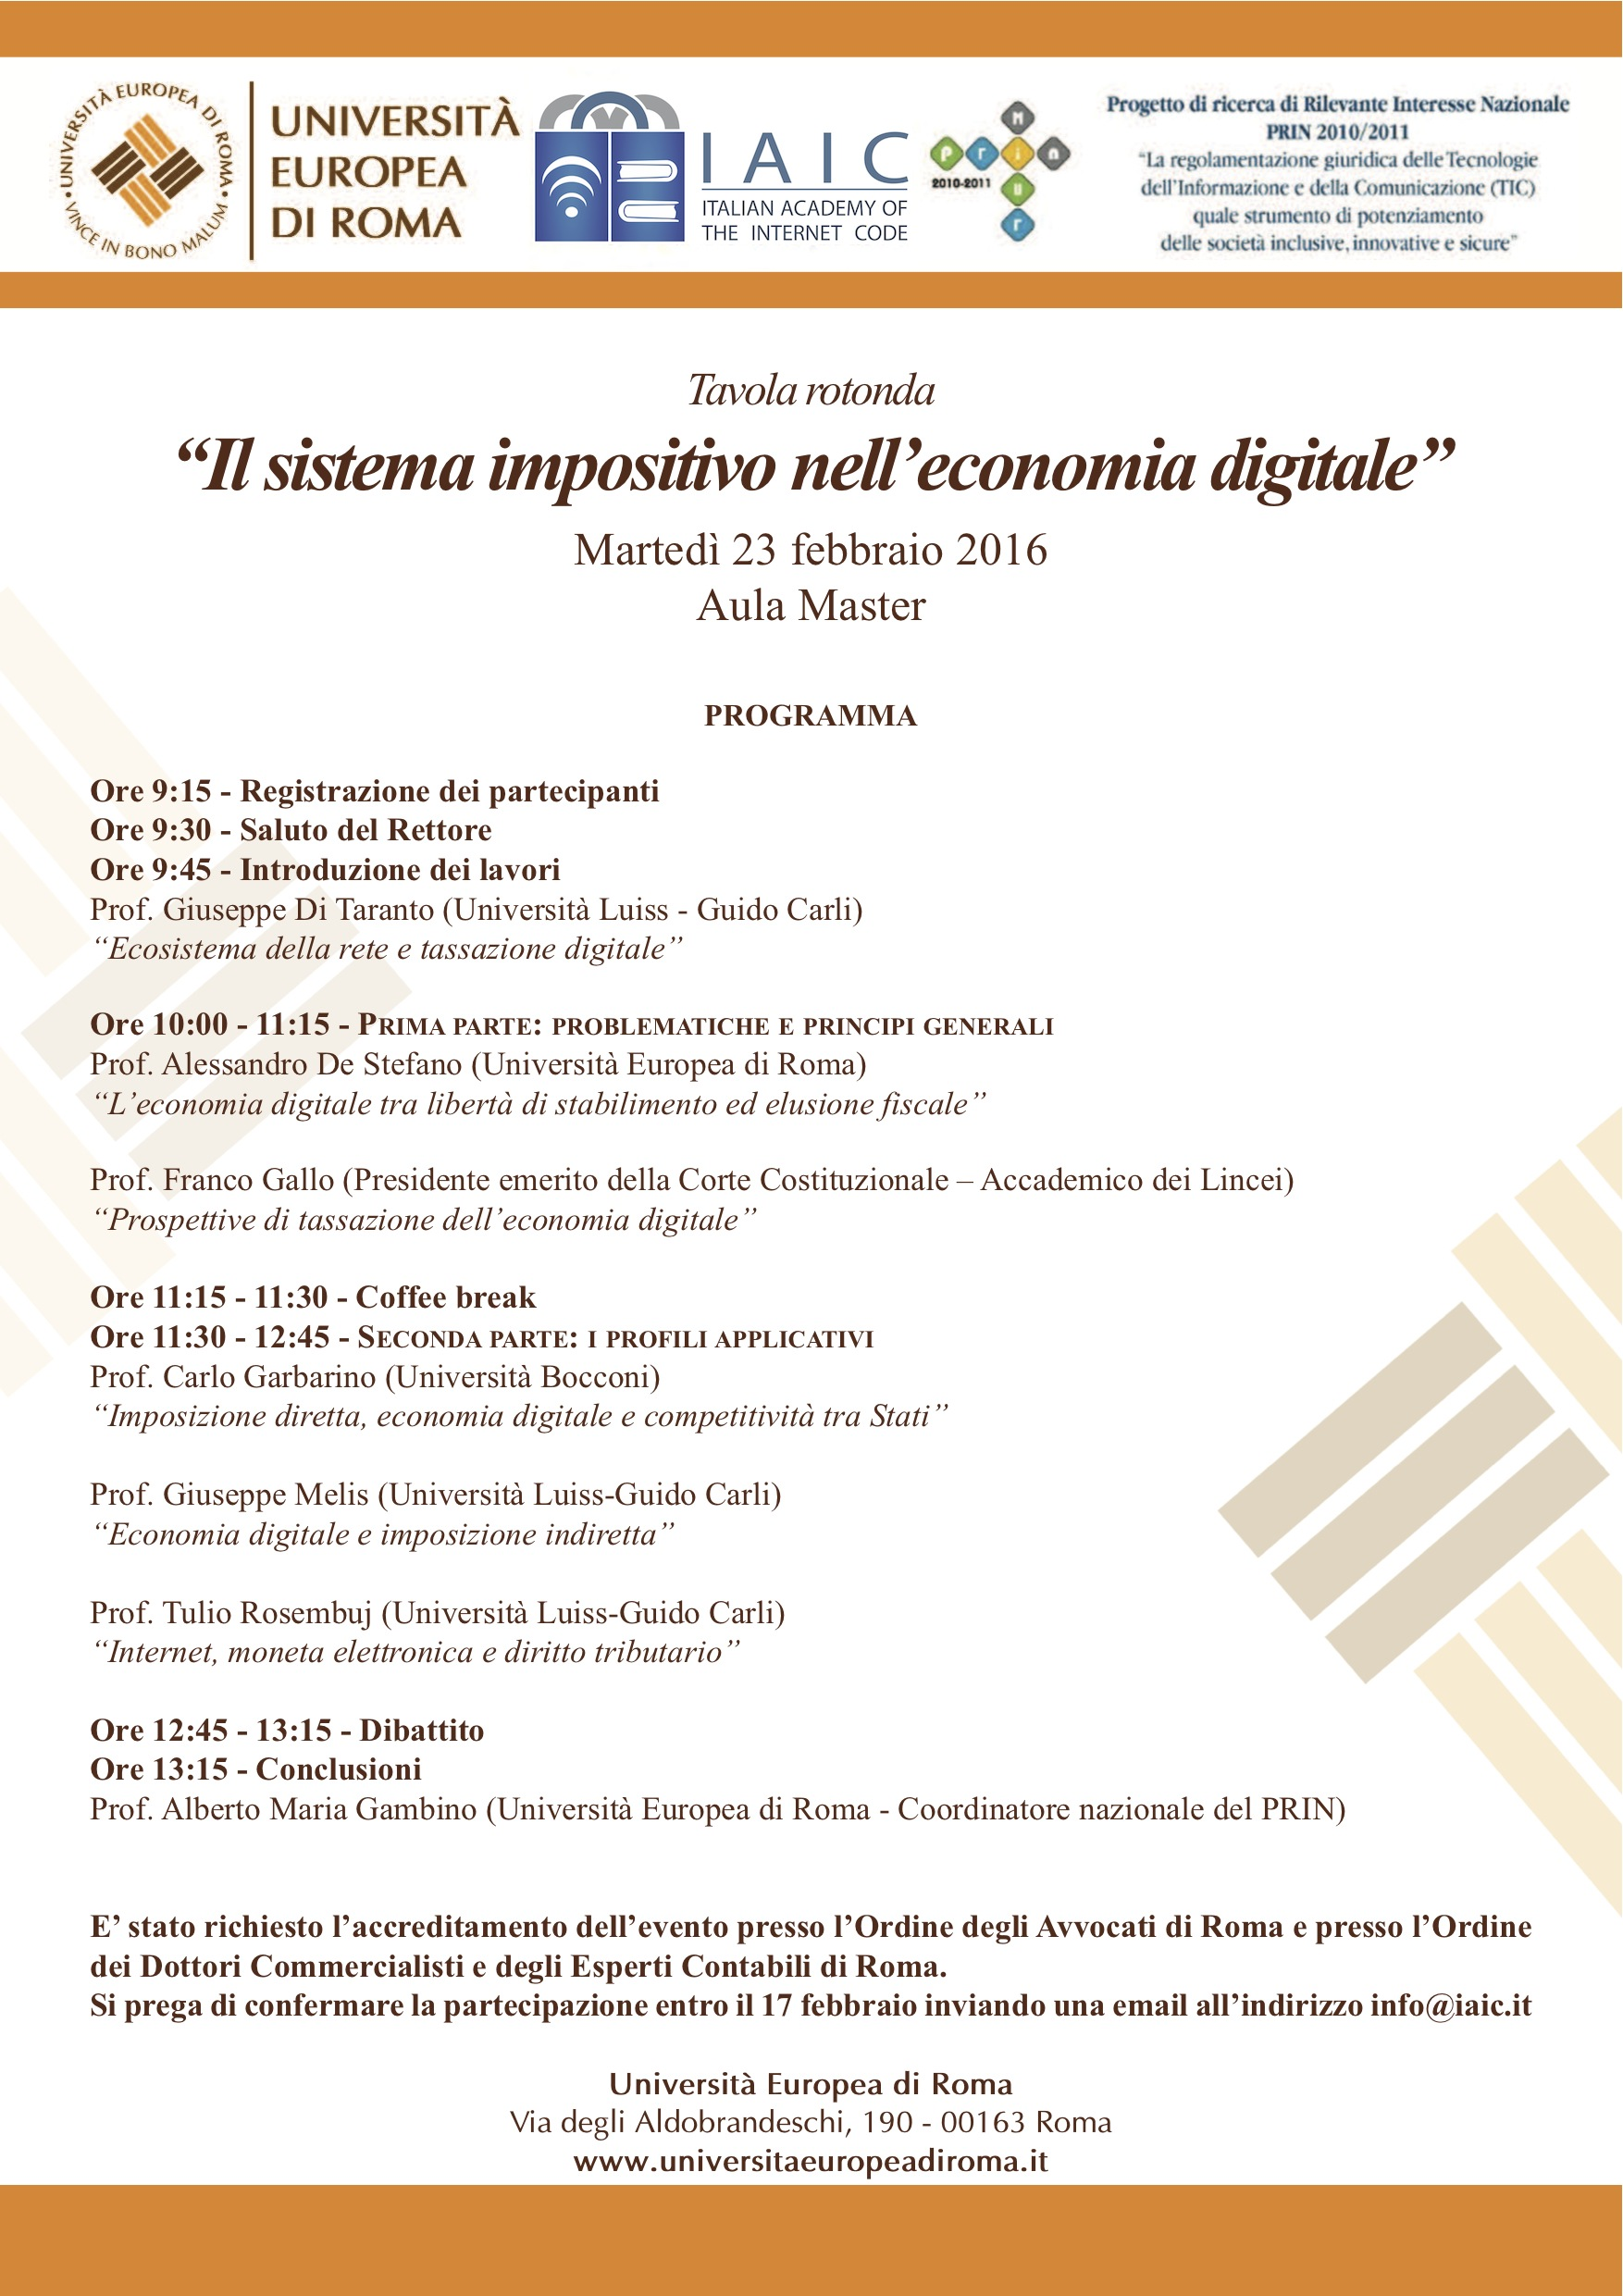 Tavola Rotonda 23 febbraio - Sistema impositivo nell'economia digitale